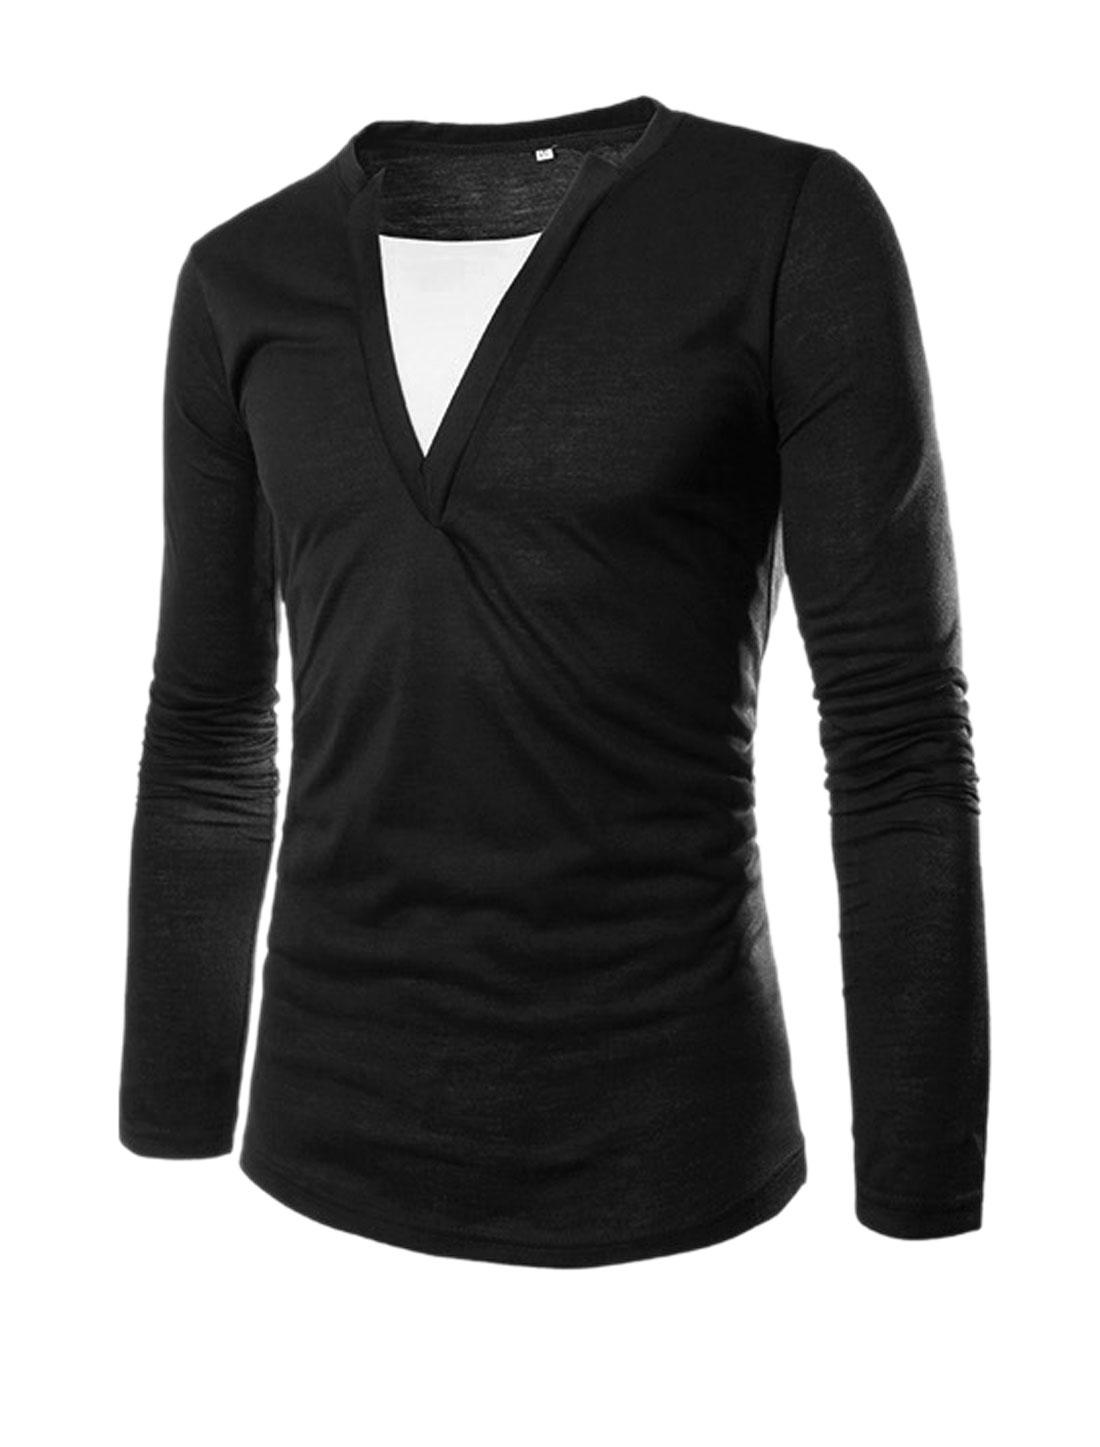 Men Black Pullover Split Neck Layered Shirts Slim Fit T-Shirt M